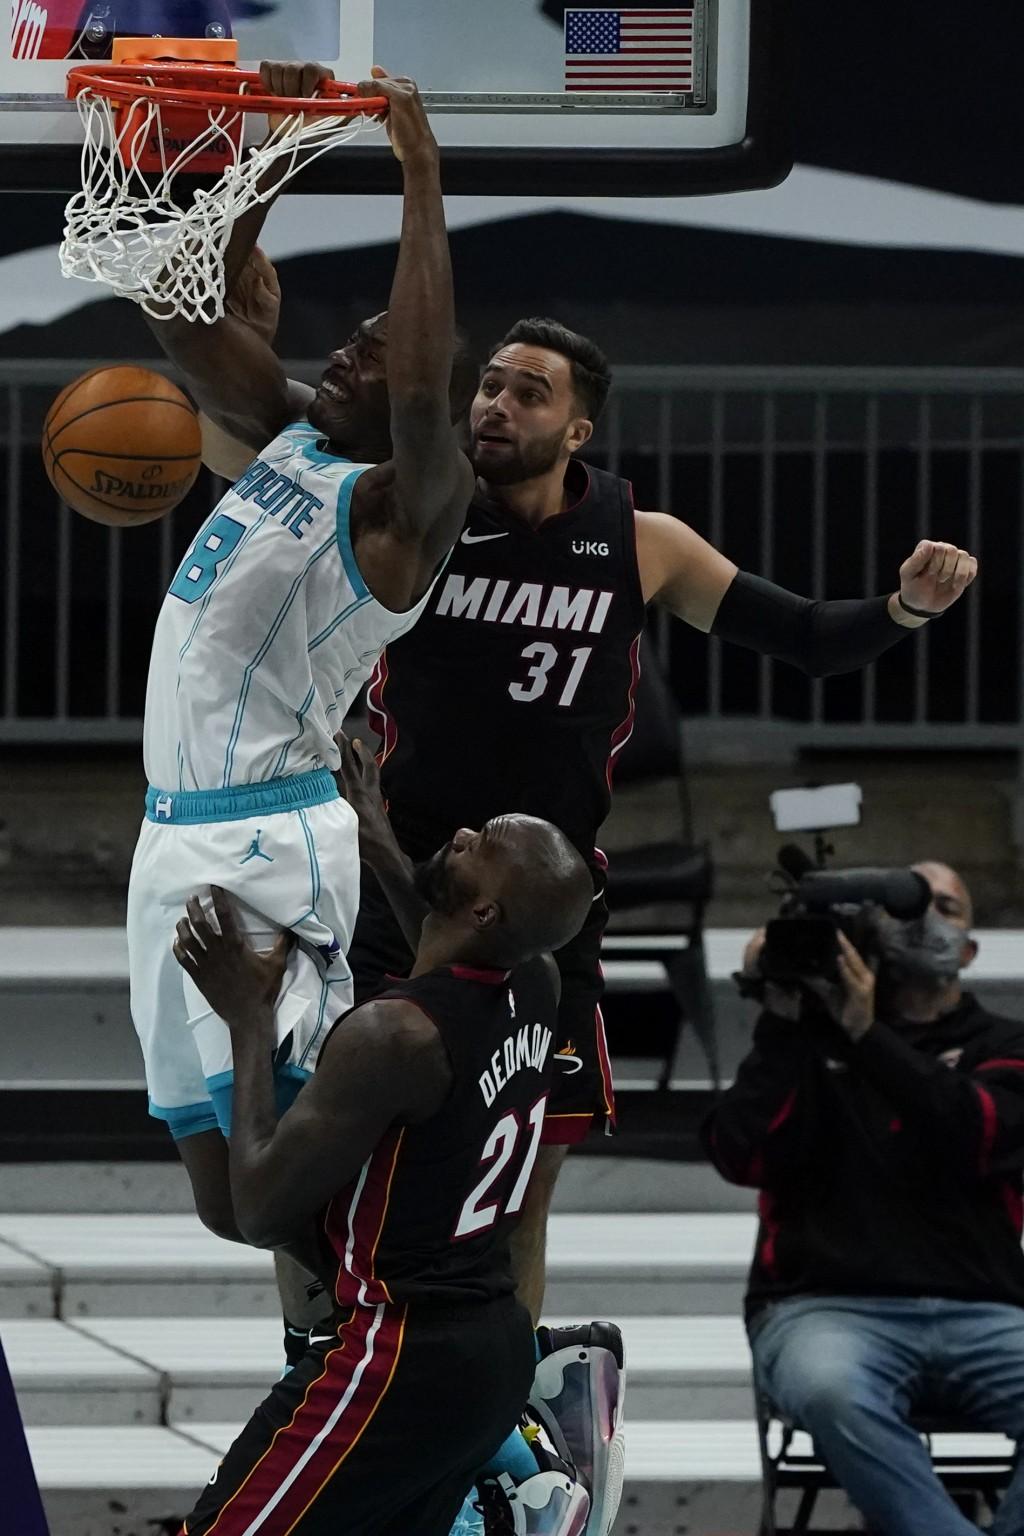 Charlotte Hornets center Bismack Biyombo dunks past Miami Heat guard Max Strus (31) and center Dewayne Dedmon during the first half of an NBA basketba...